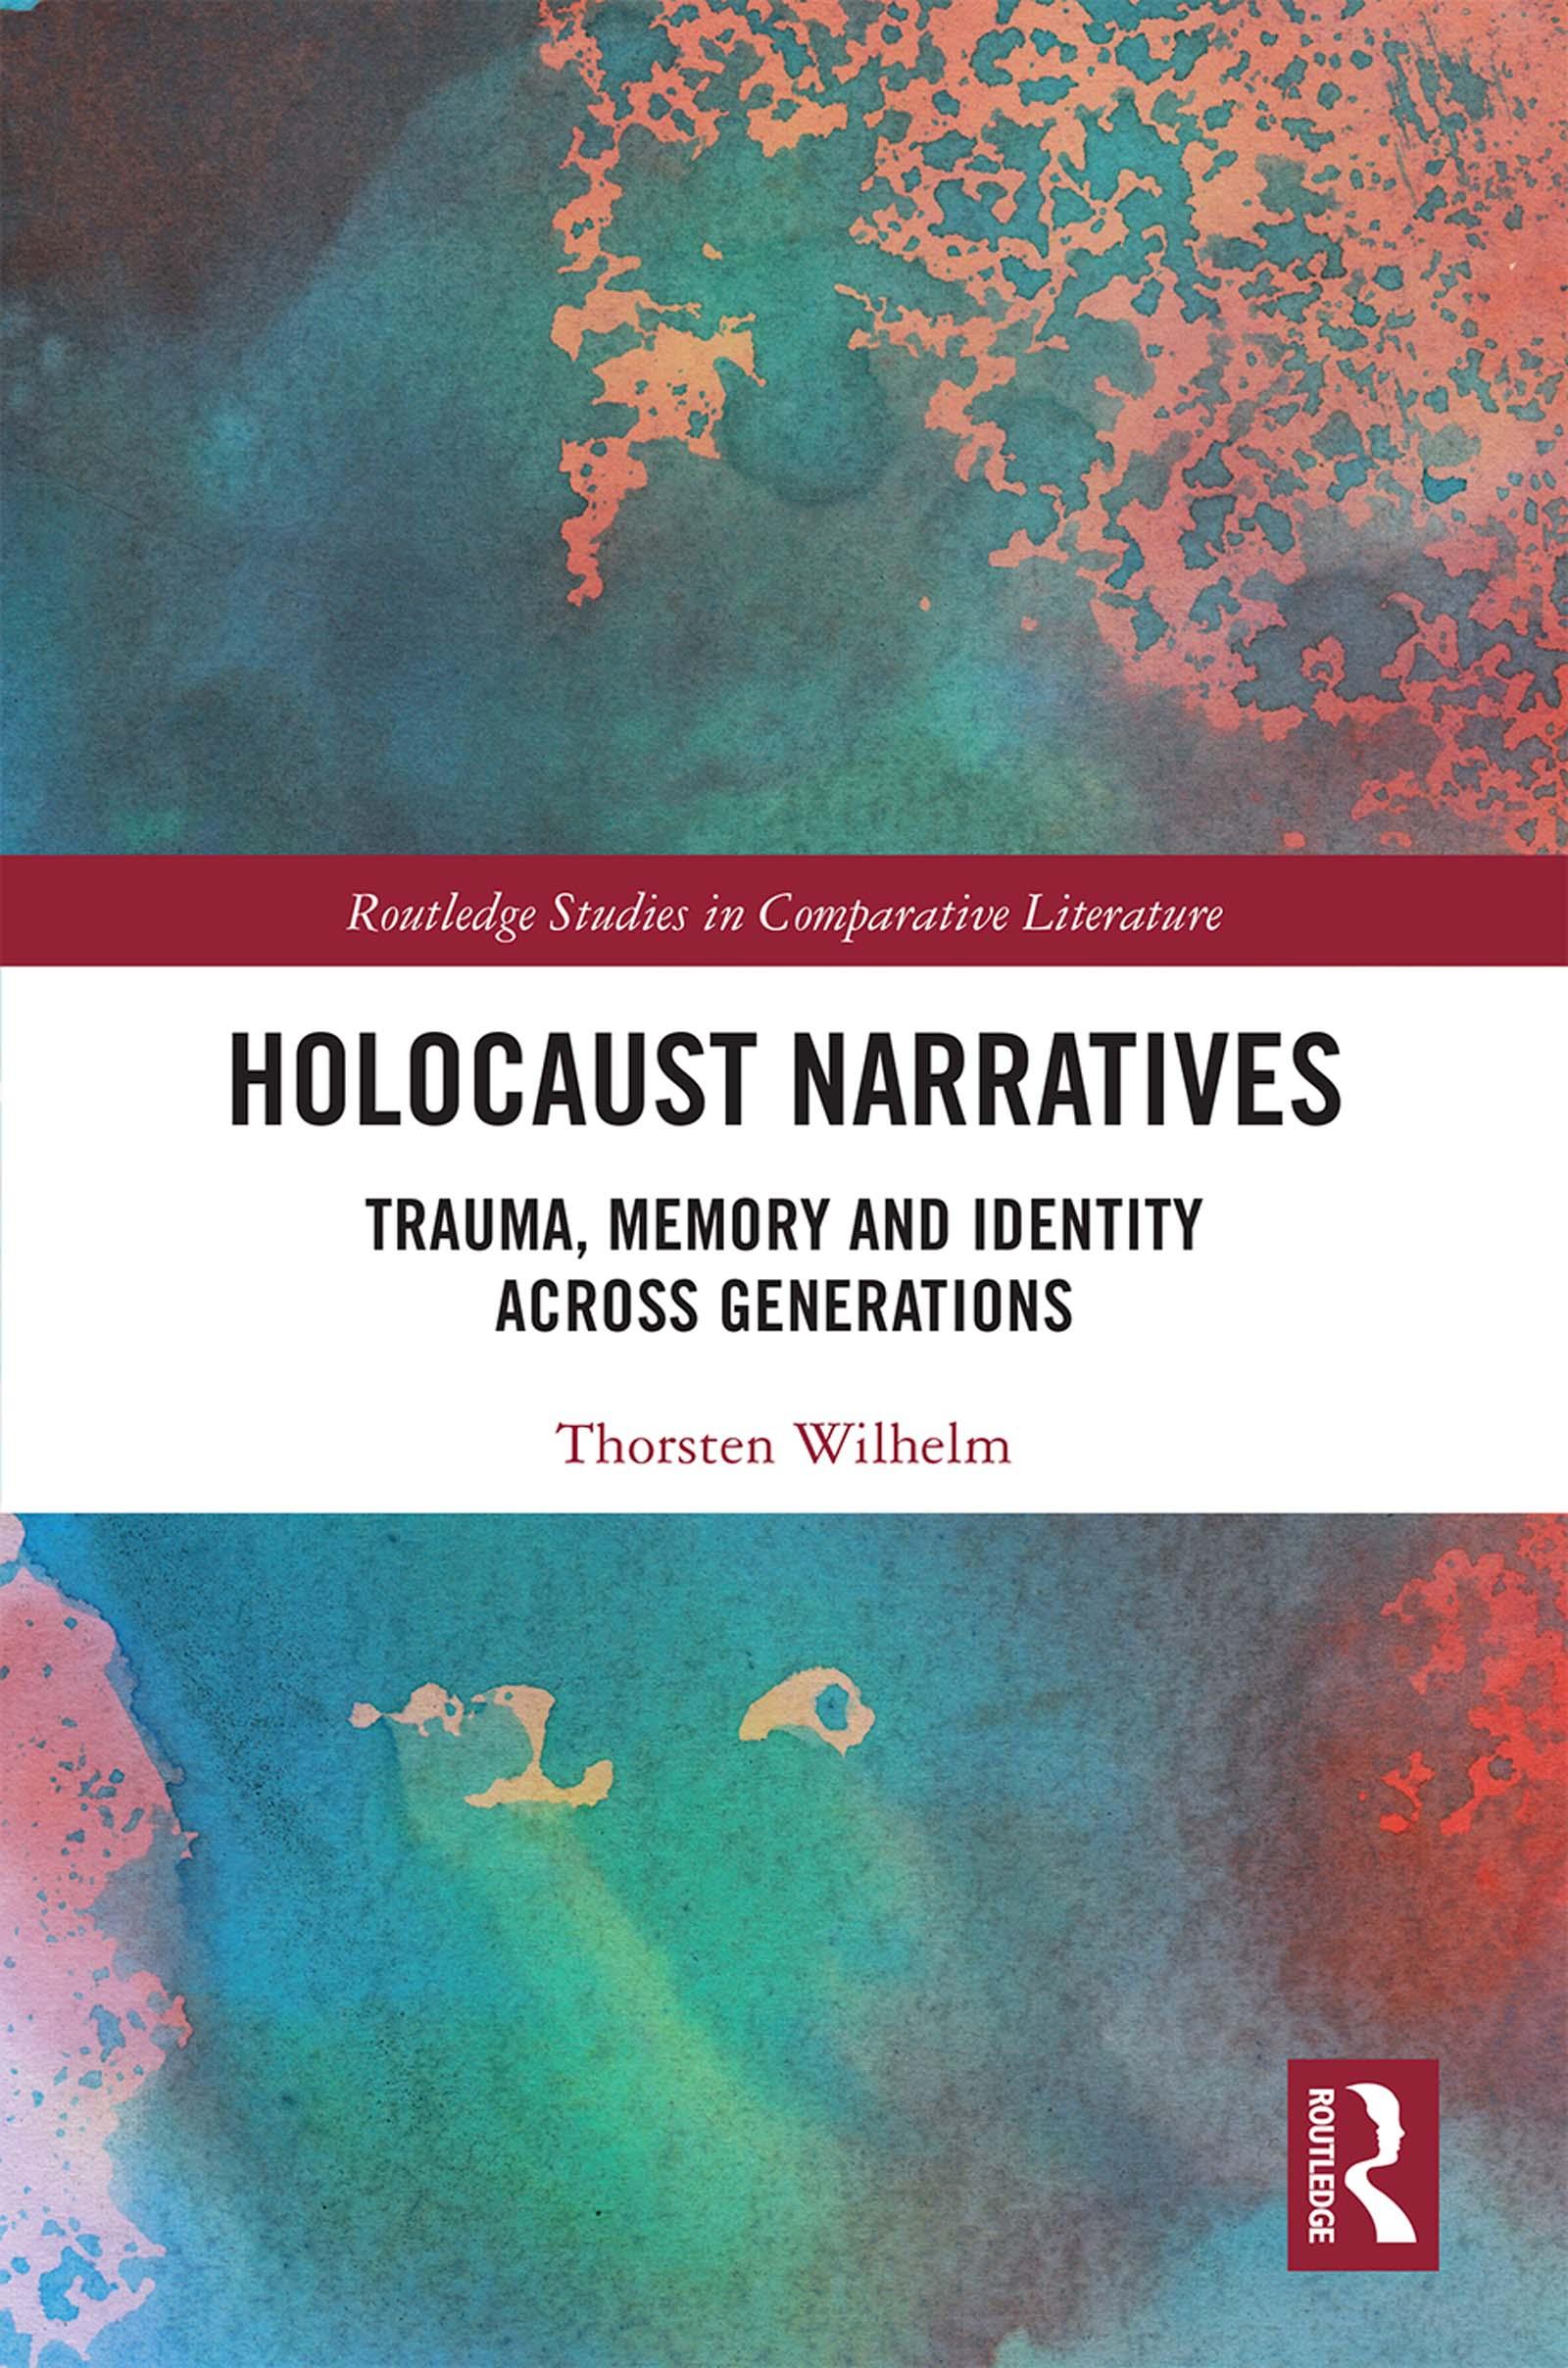 Holocaust Narratives